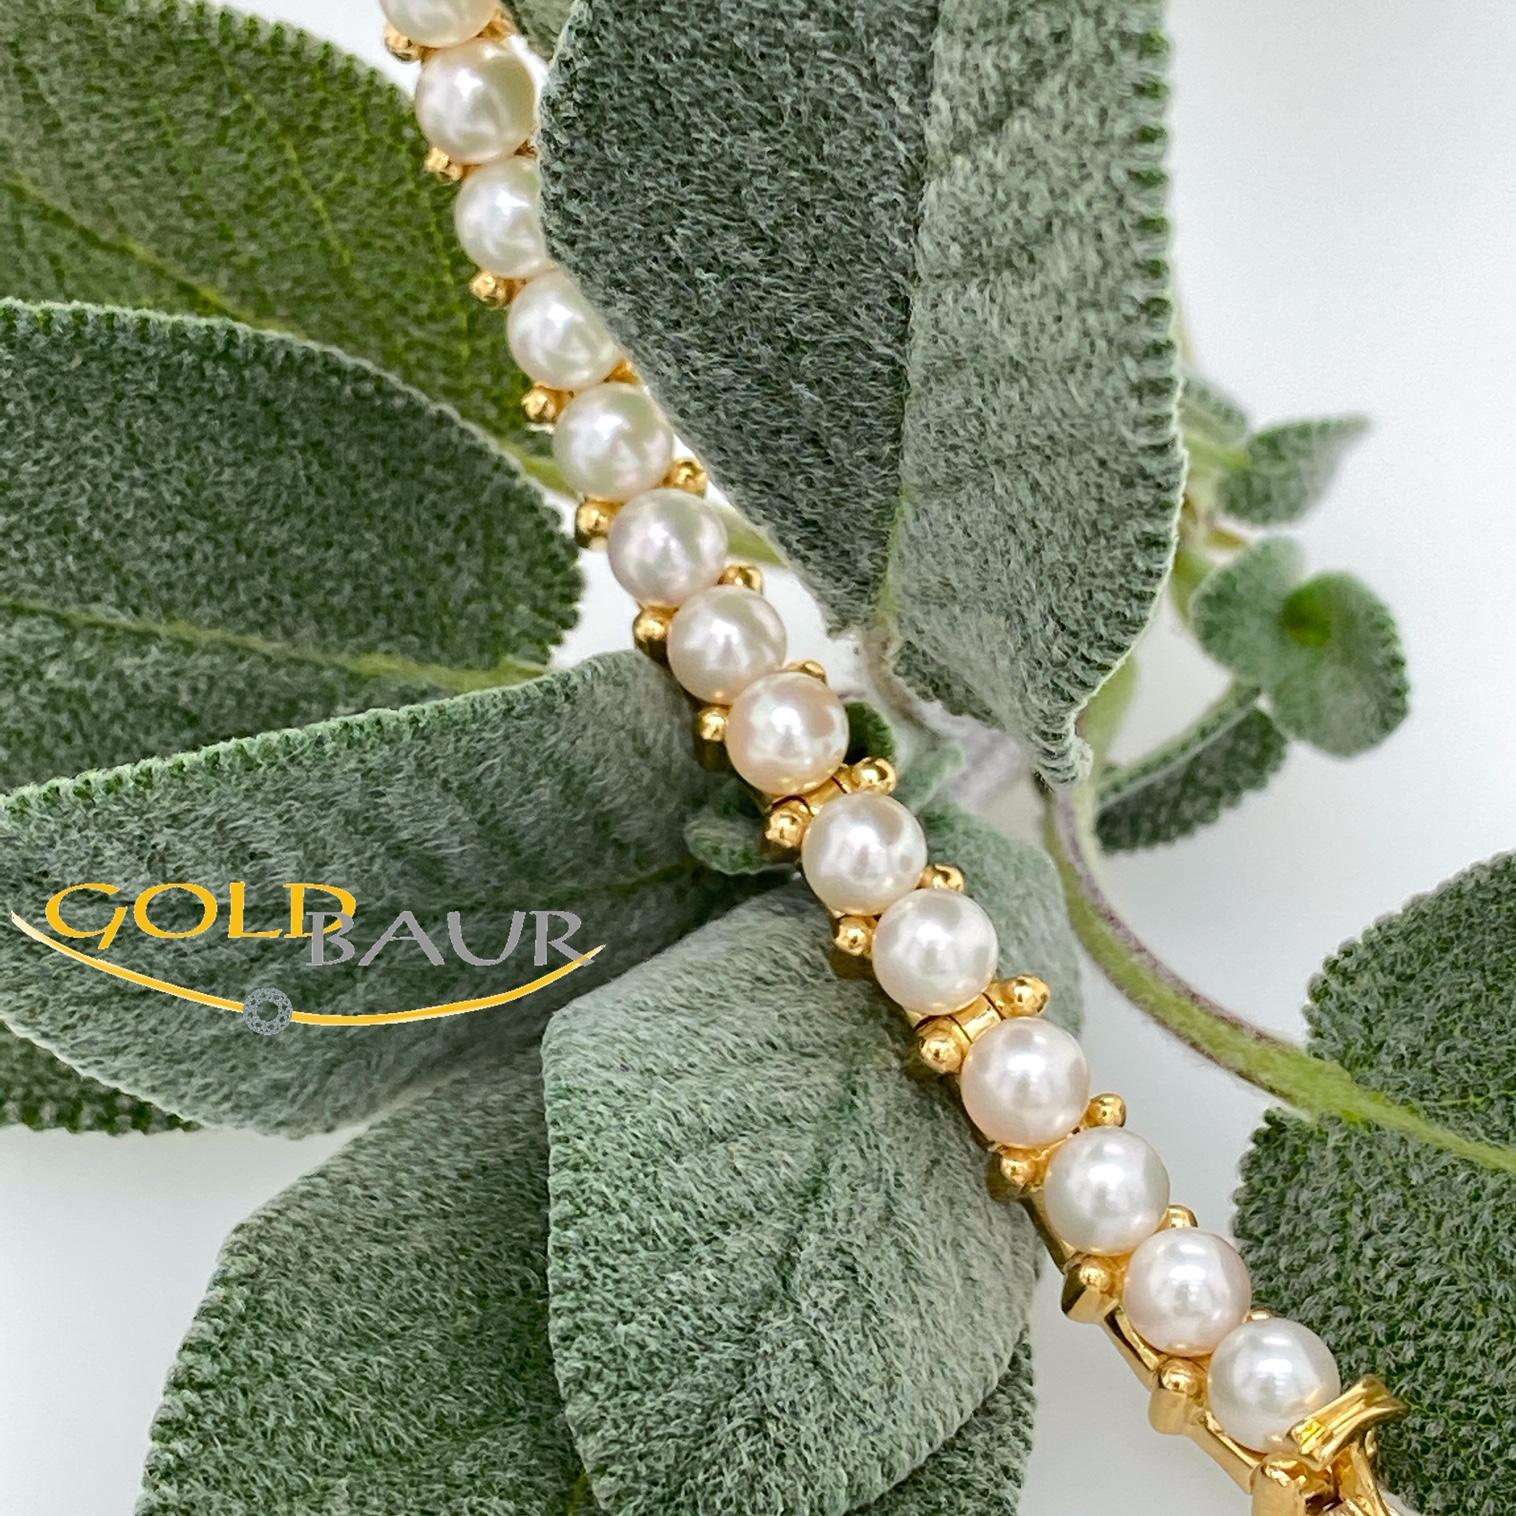 Armband, Perl-Armband,Perle, beweglich, 750/Gelbgold, Handarbeit